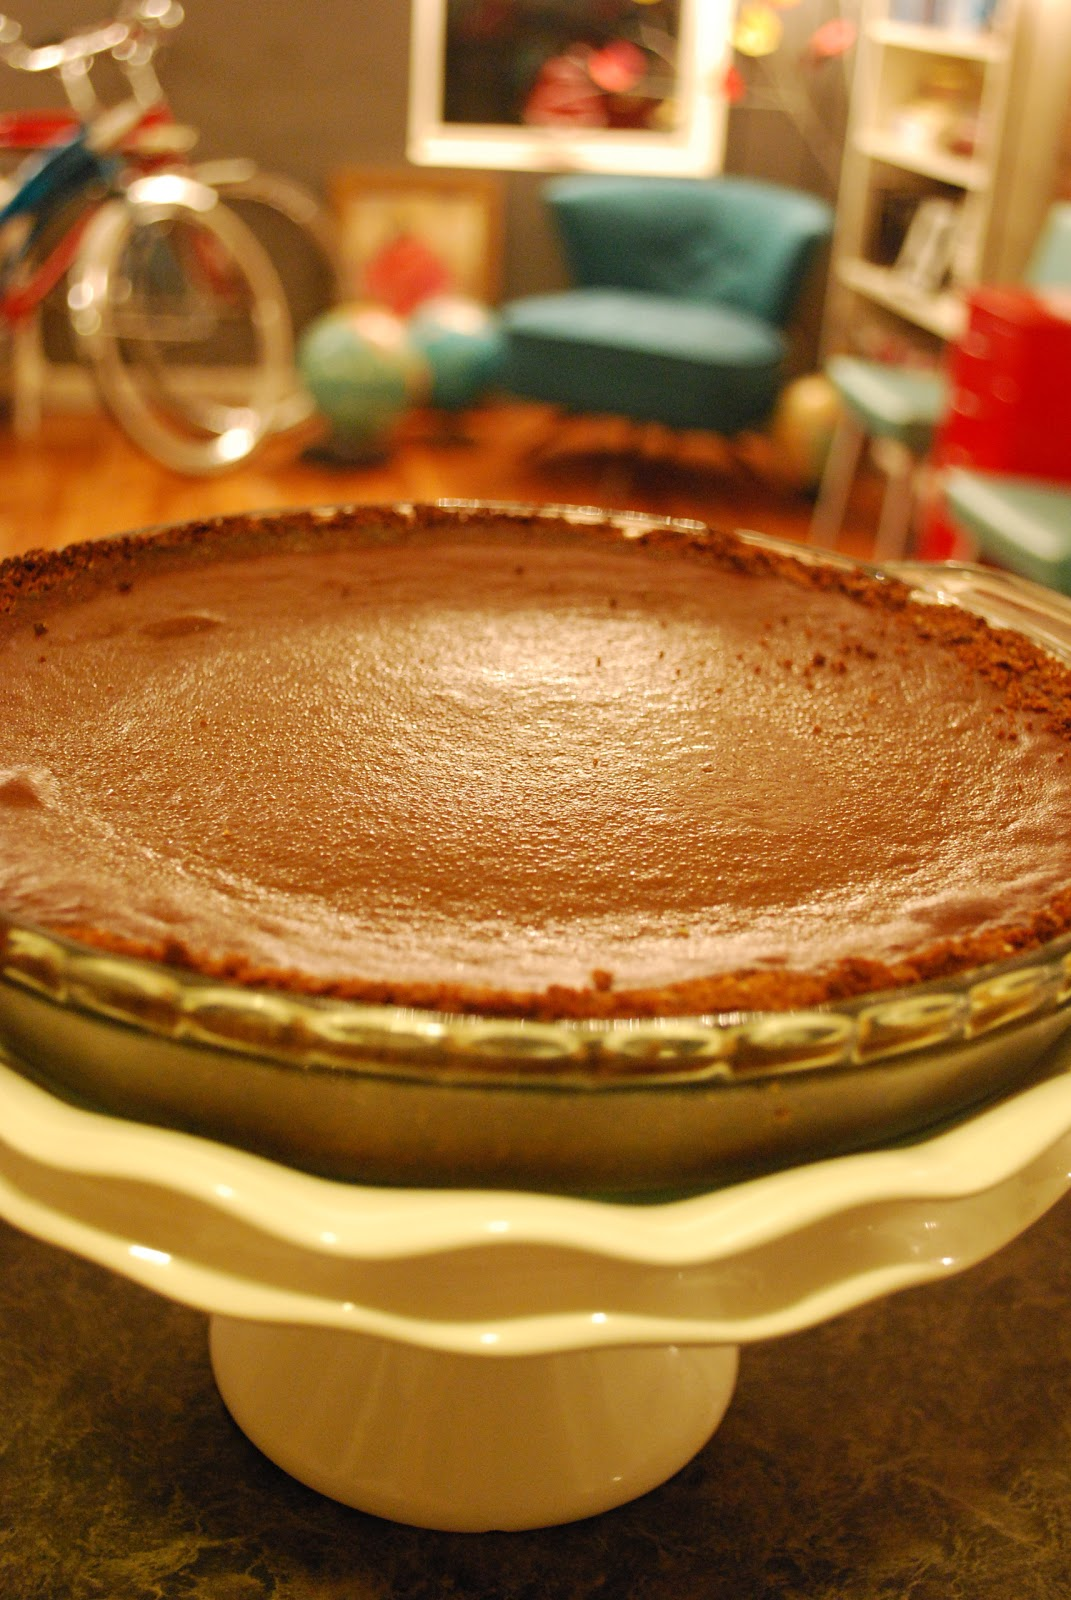 Pie Love You: Chocolate Pumpkin Pie #43